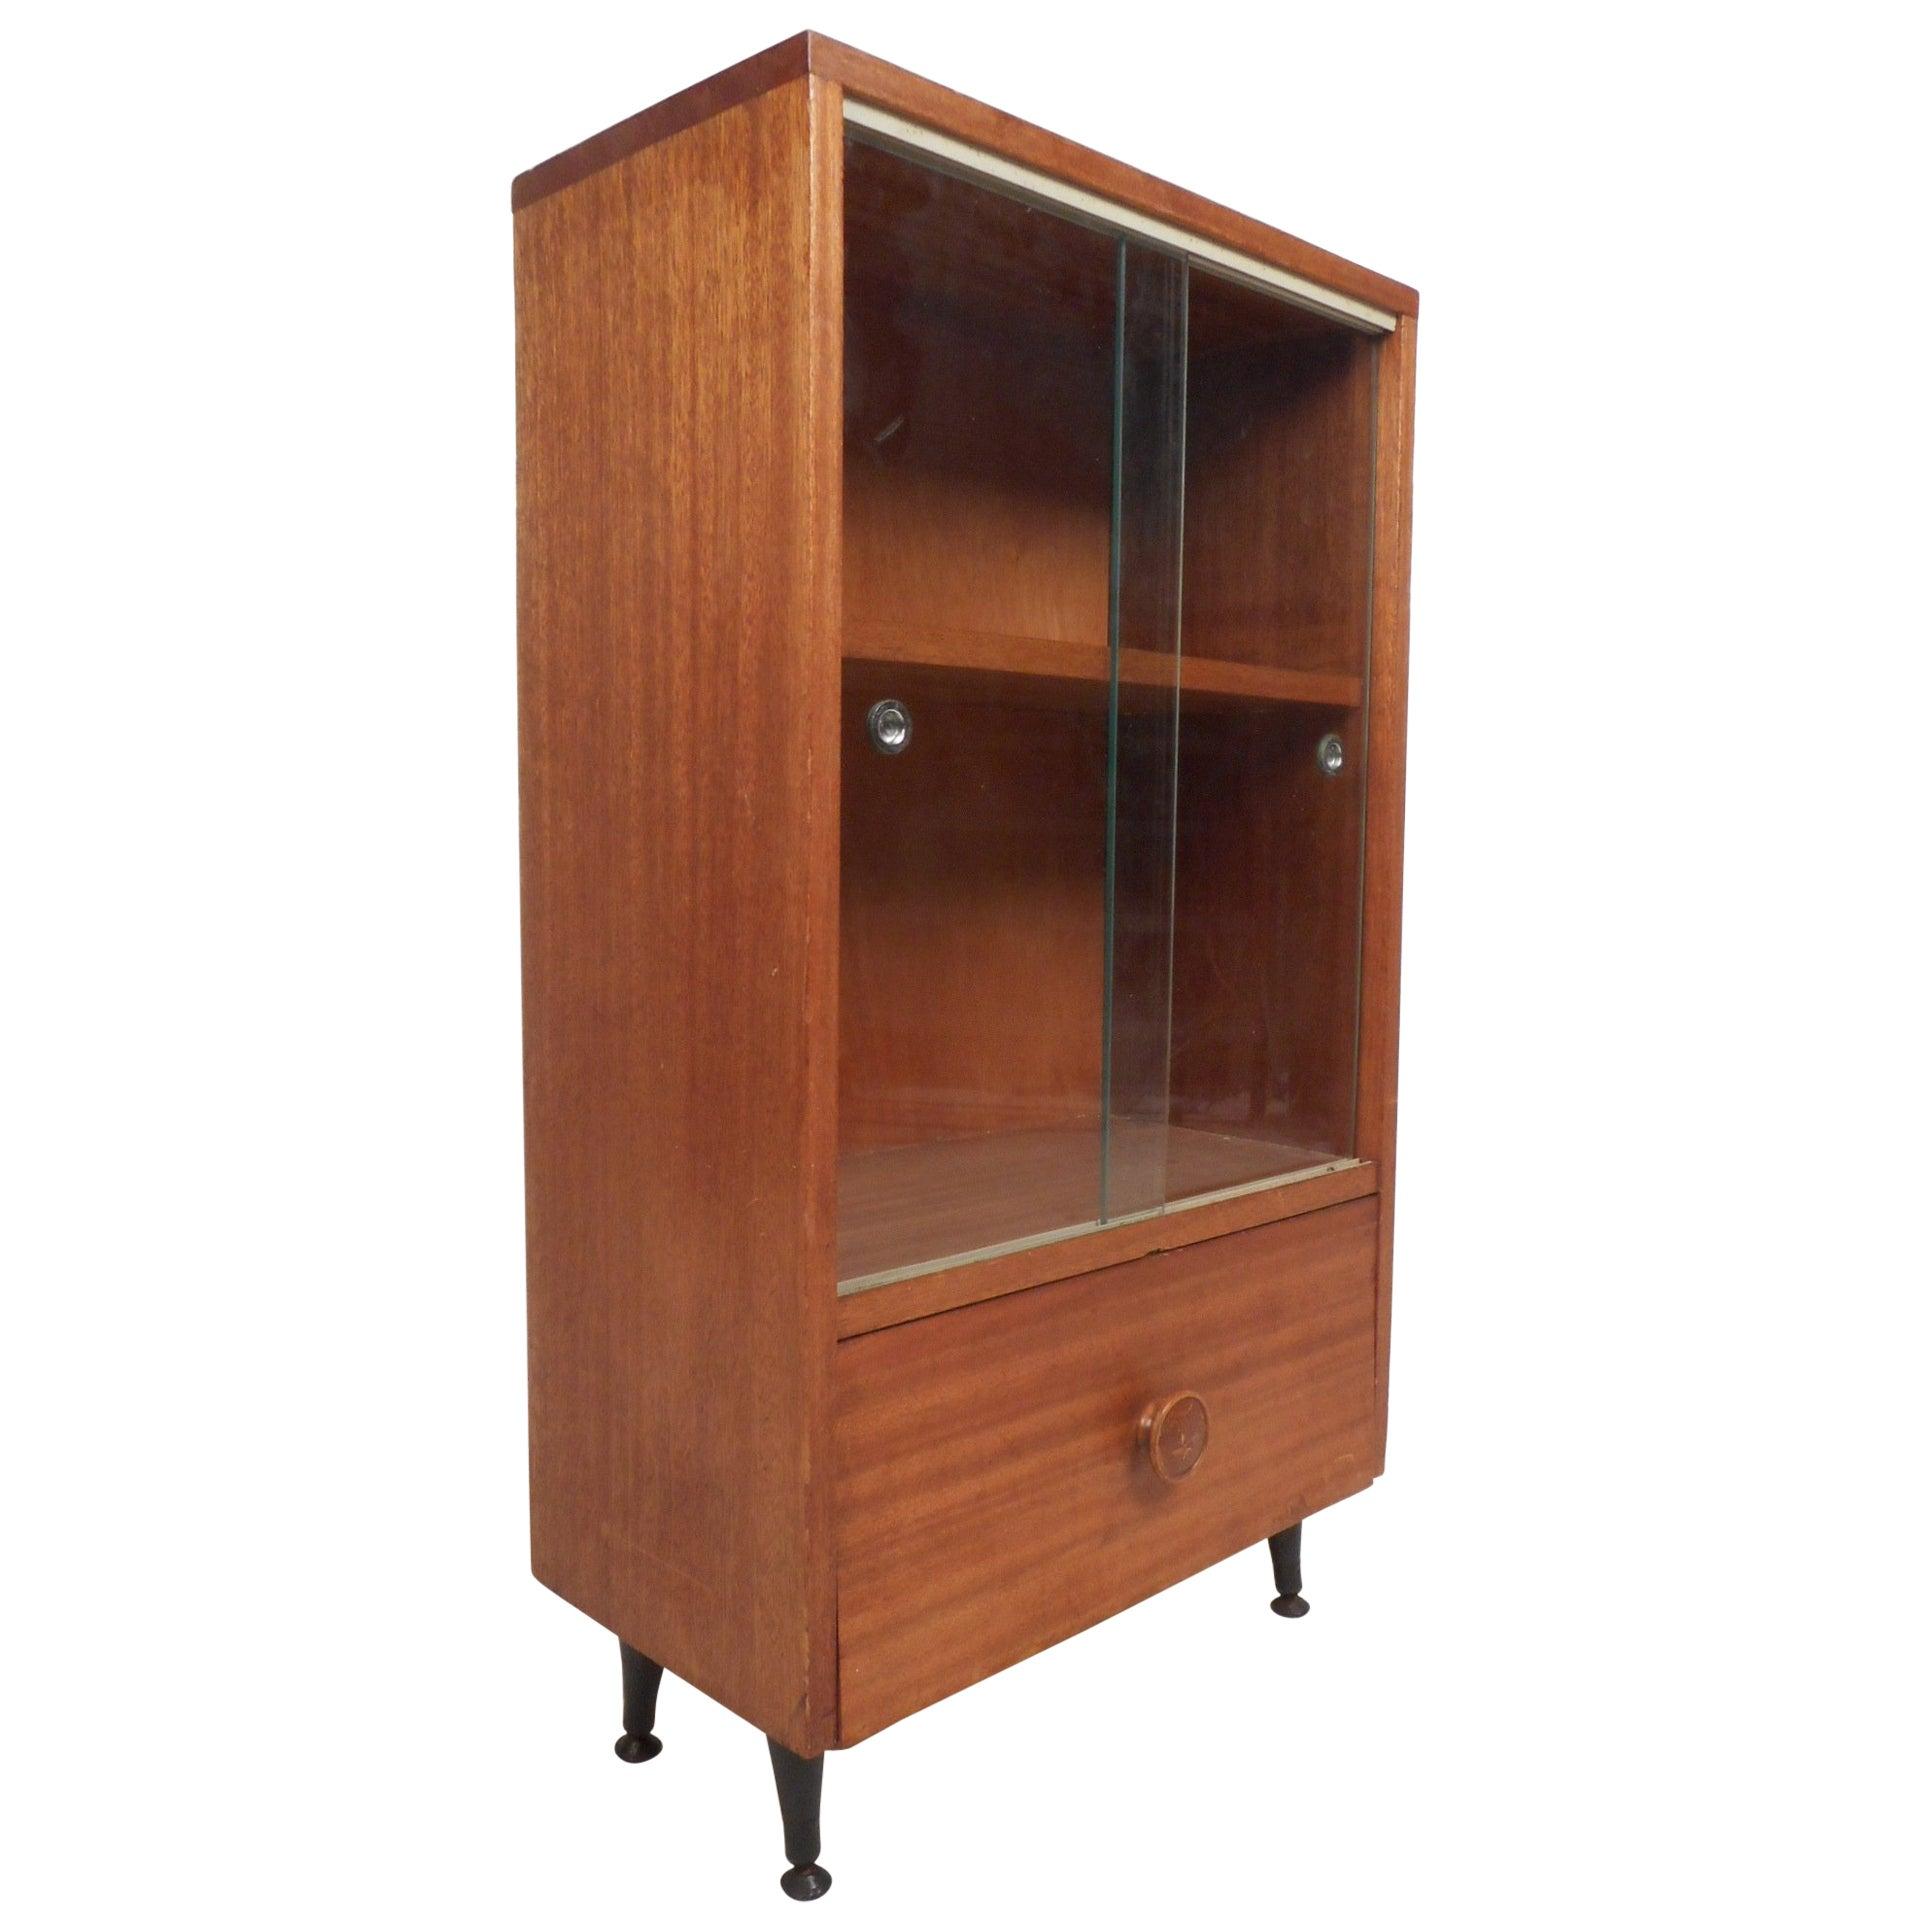 Midcentury Small Walnut Bookshelf or Cabinet